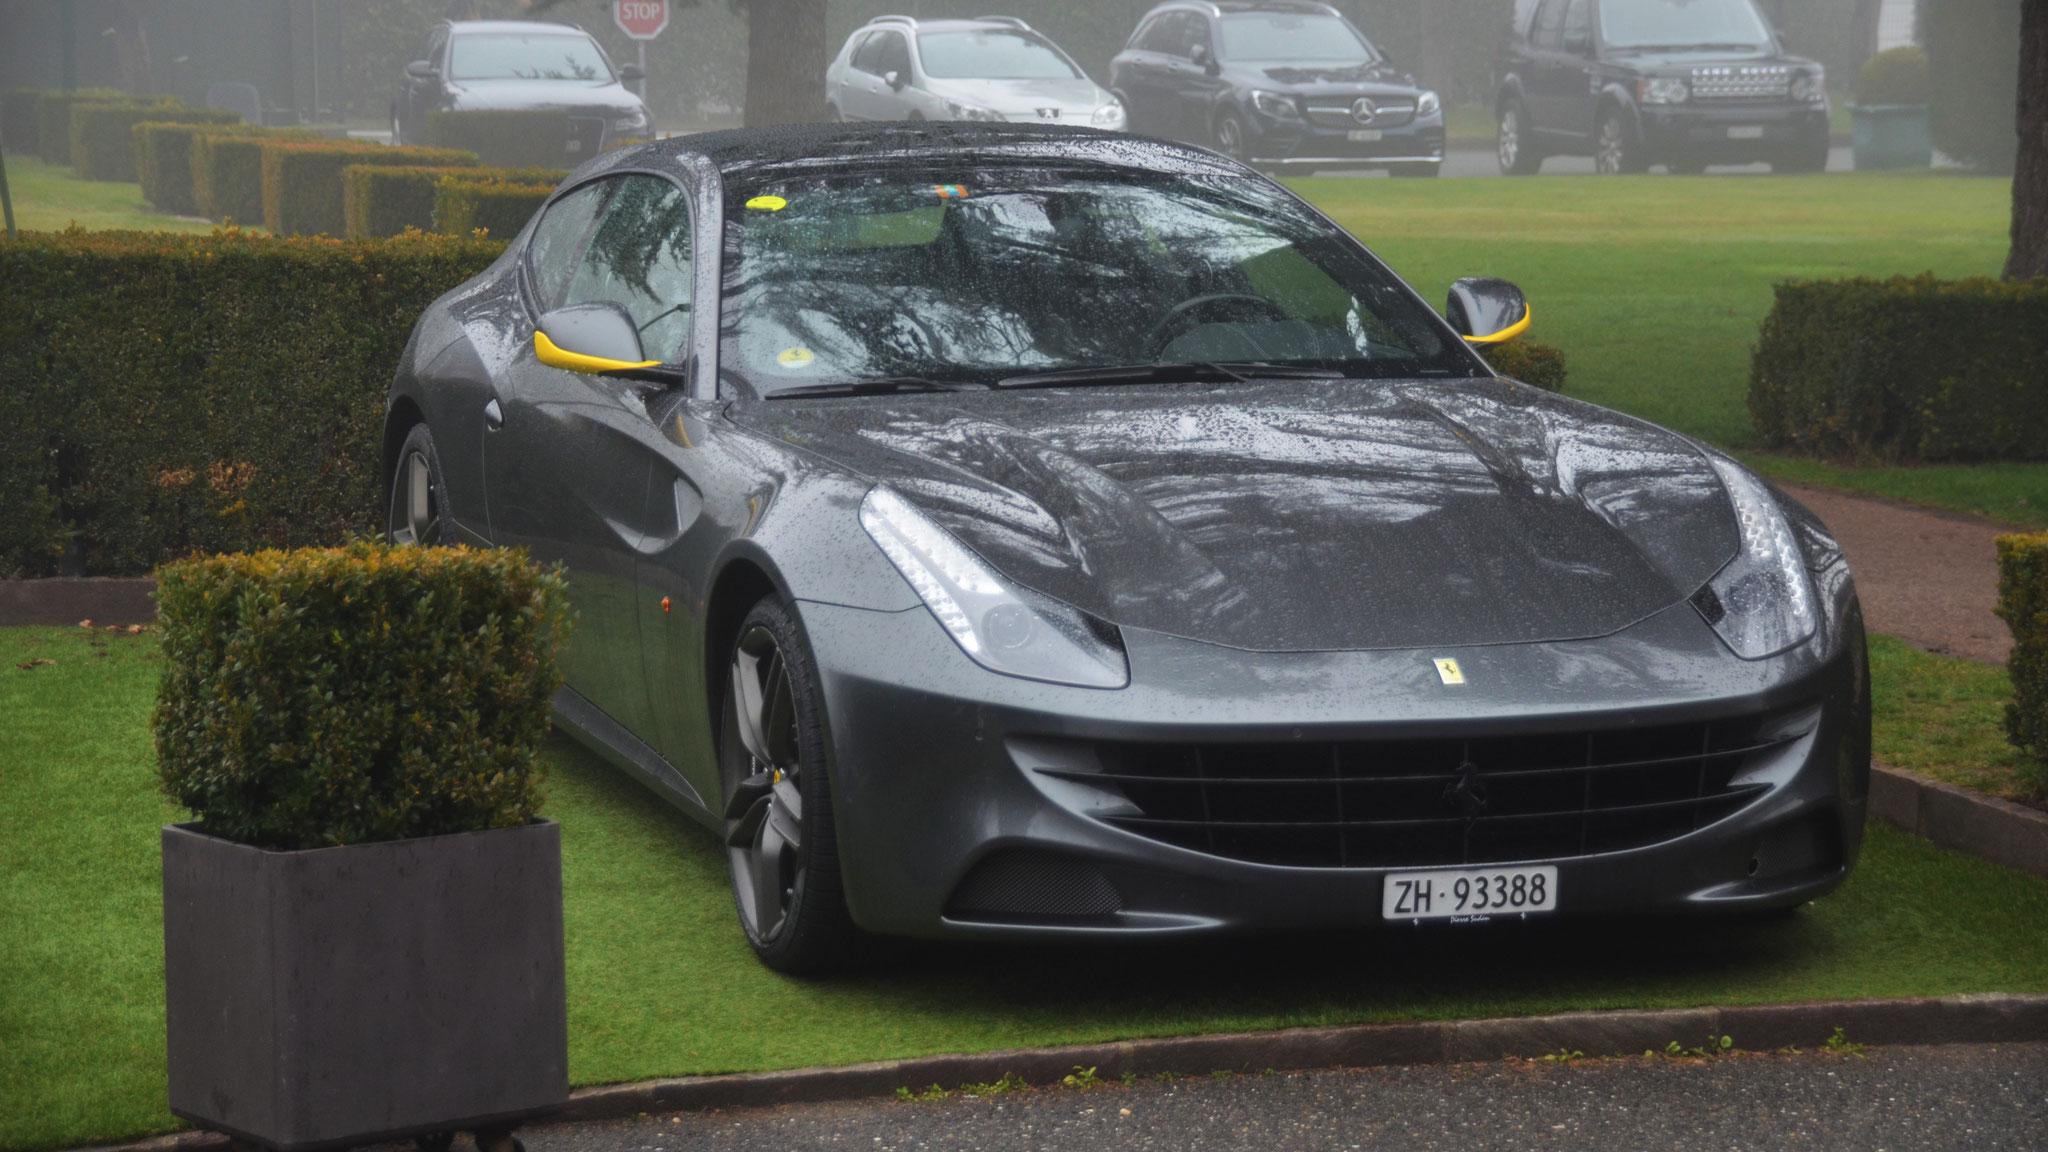 Ferrari FF - ZH-93388 (CH)